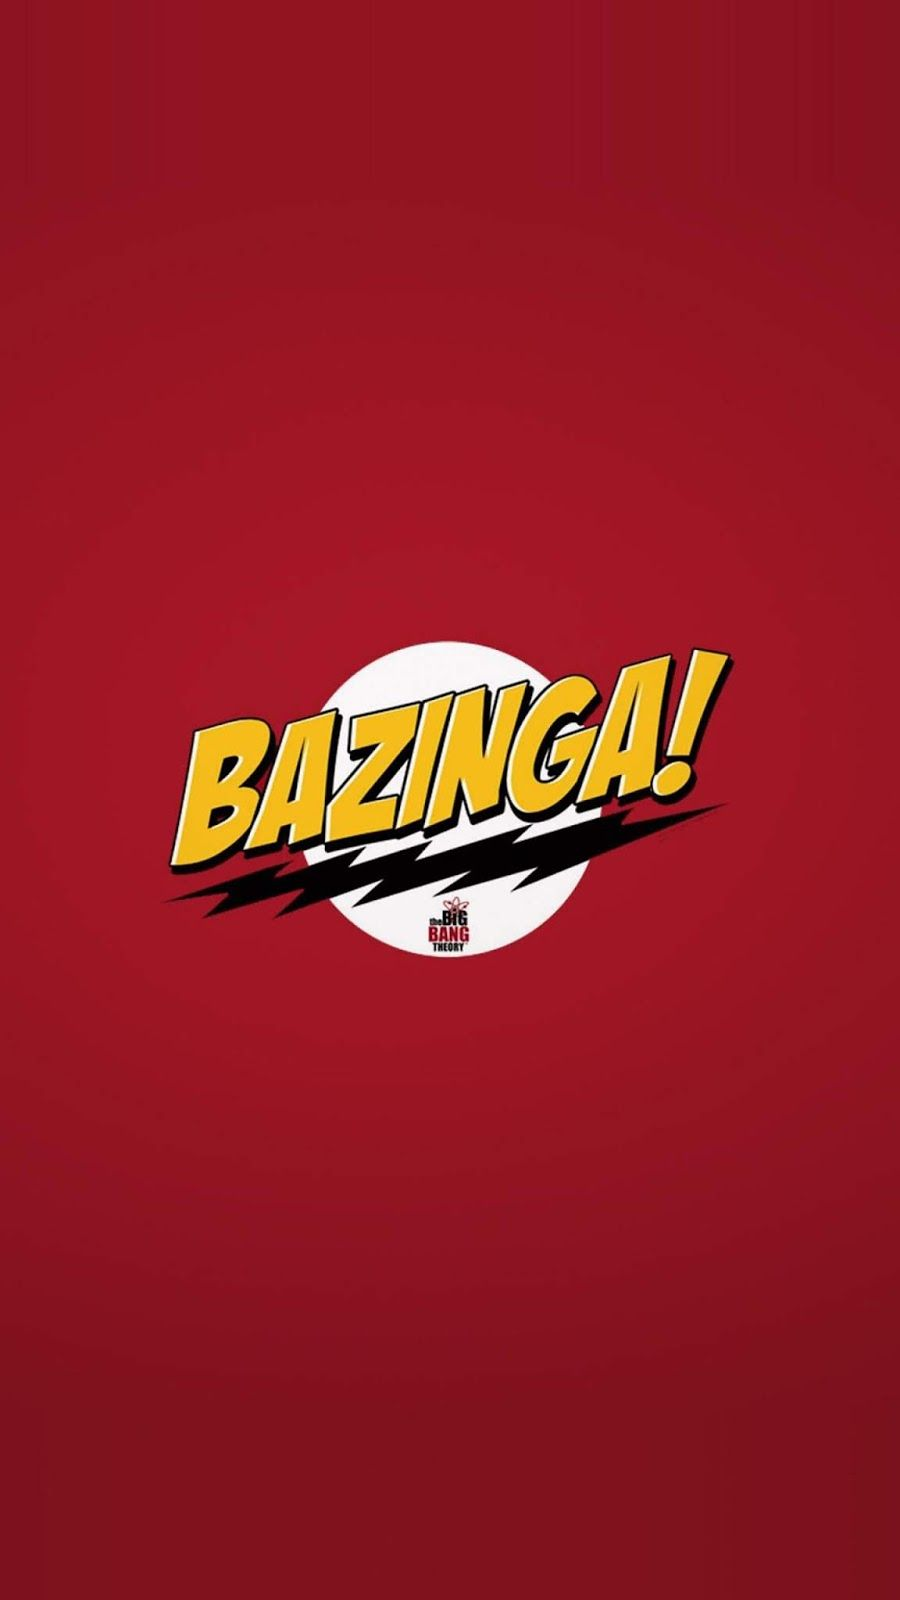 The Big Bang Theory Iphone Wallpapers Top Free The Big Bang Theory Iphone Backgrounds Wallpaperaccess